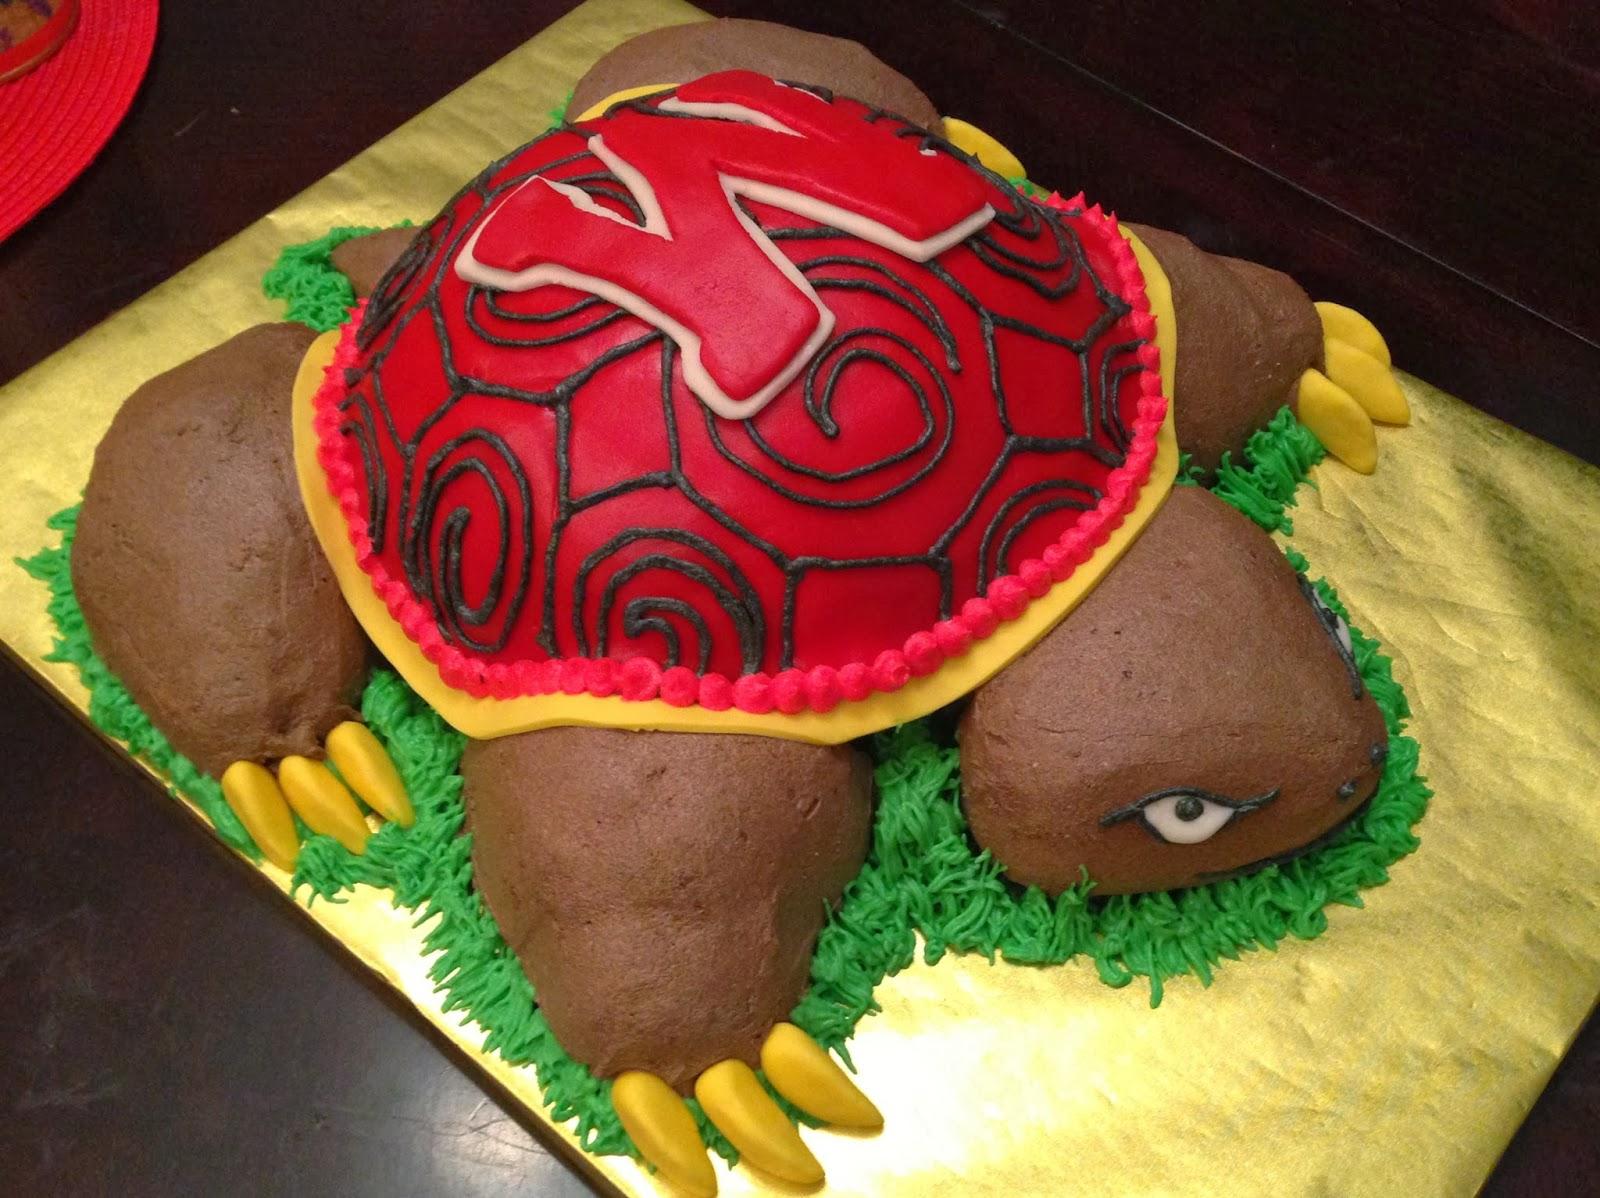 University Of Maryland Mascot >> Joyce Gourmet: University of Maryland's Mascot: The Testudo Cake